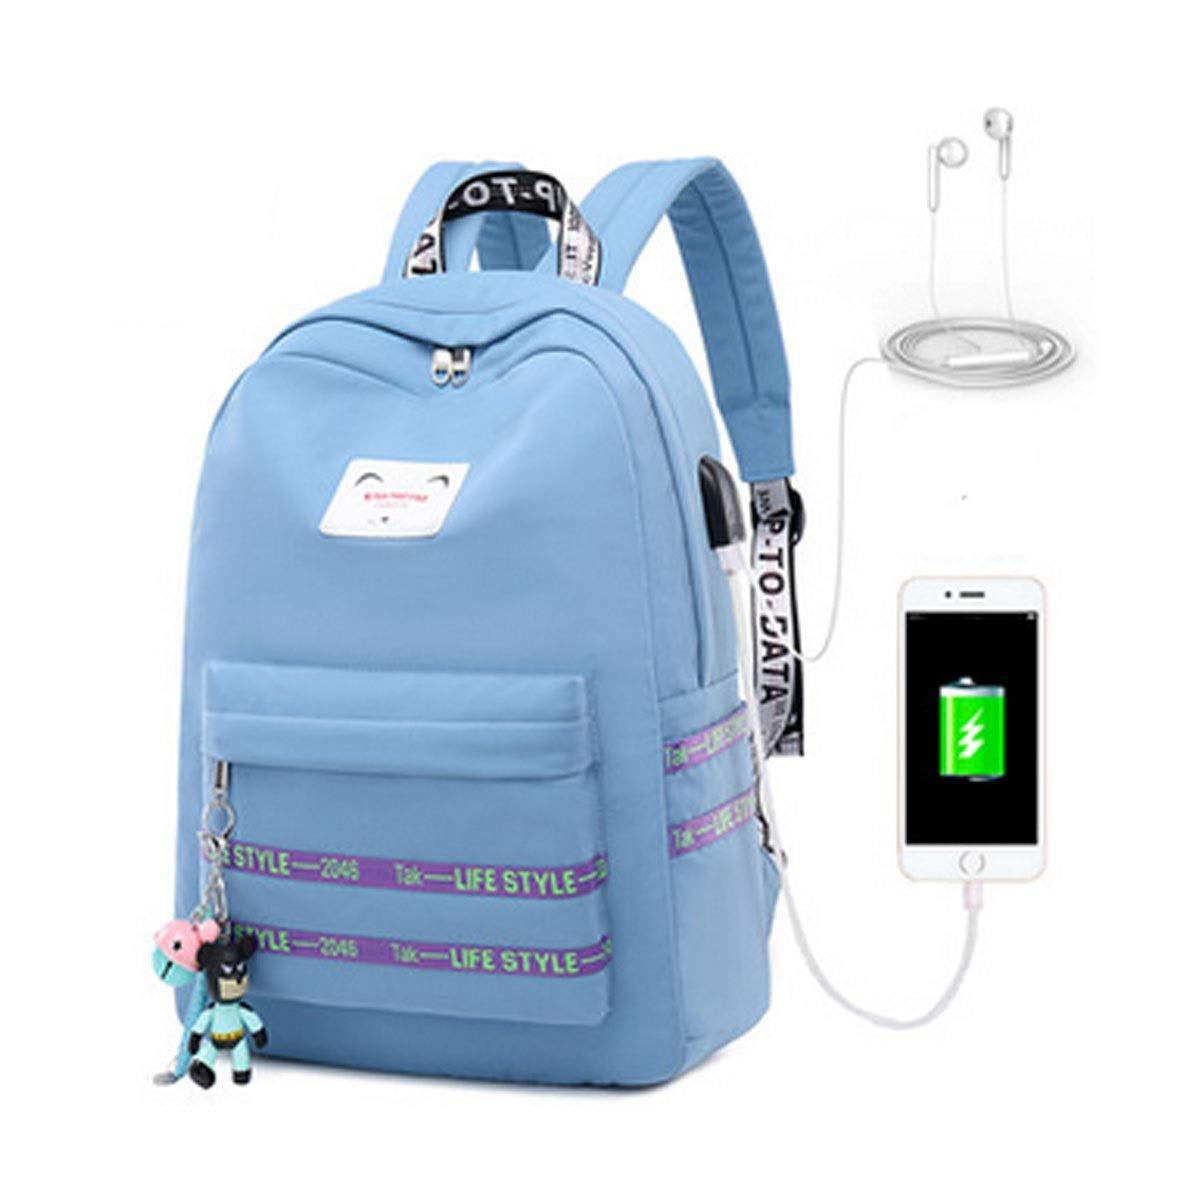 Light bluee 281139cmA2 School Bag, Student Backpack, Casual Backpack, Wearresistant Waterproof Backpack, Suitable For Junior High School Students, High School Students, Office Workers, 311242cm, Pink, Black